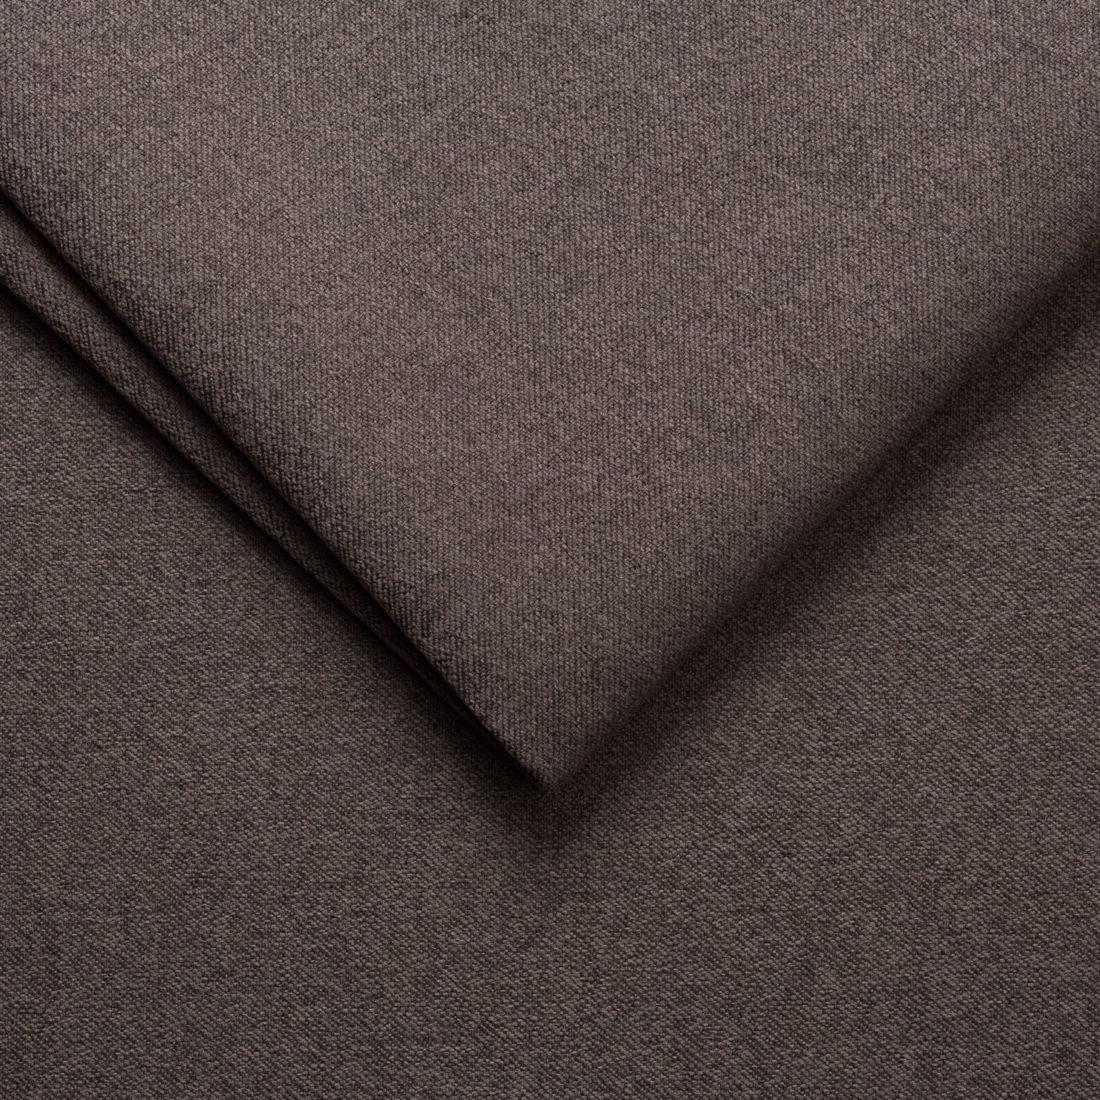 Мебельная ткань Evolution 3 Antelope, жаккард